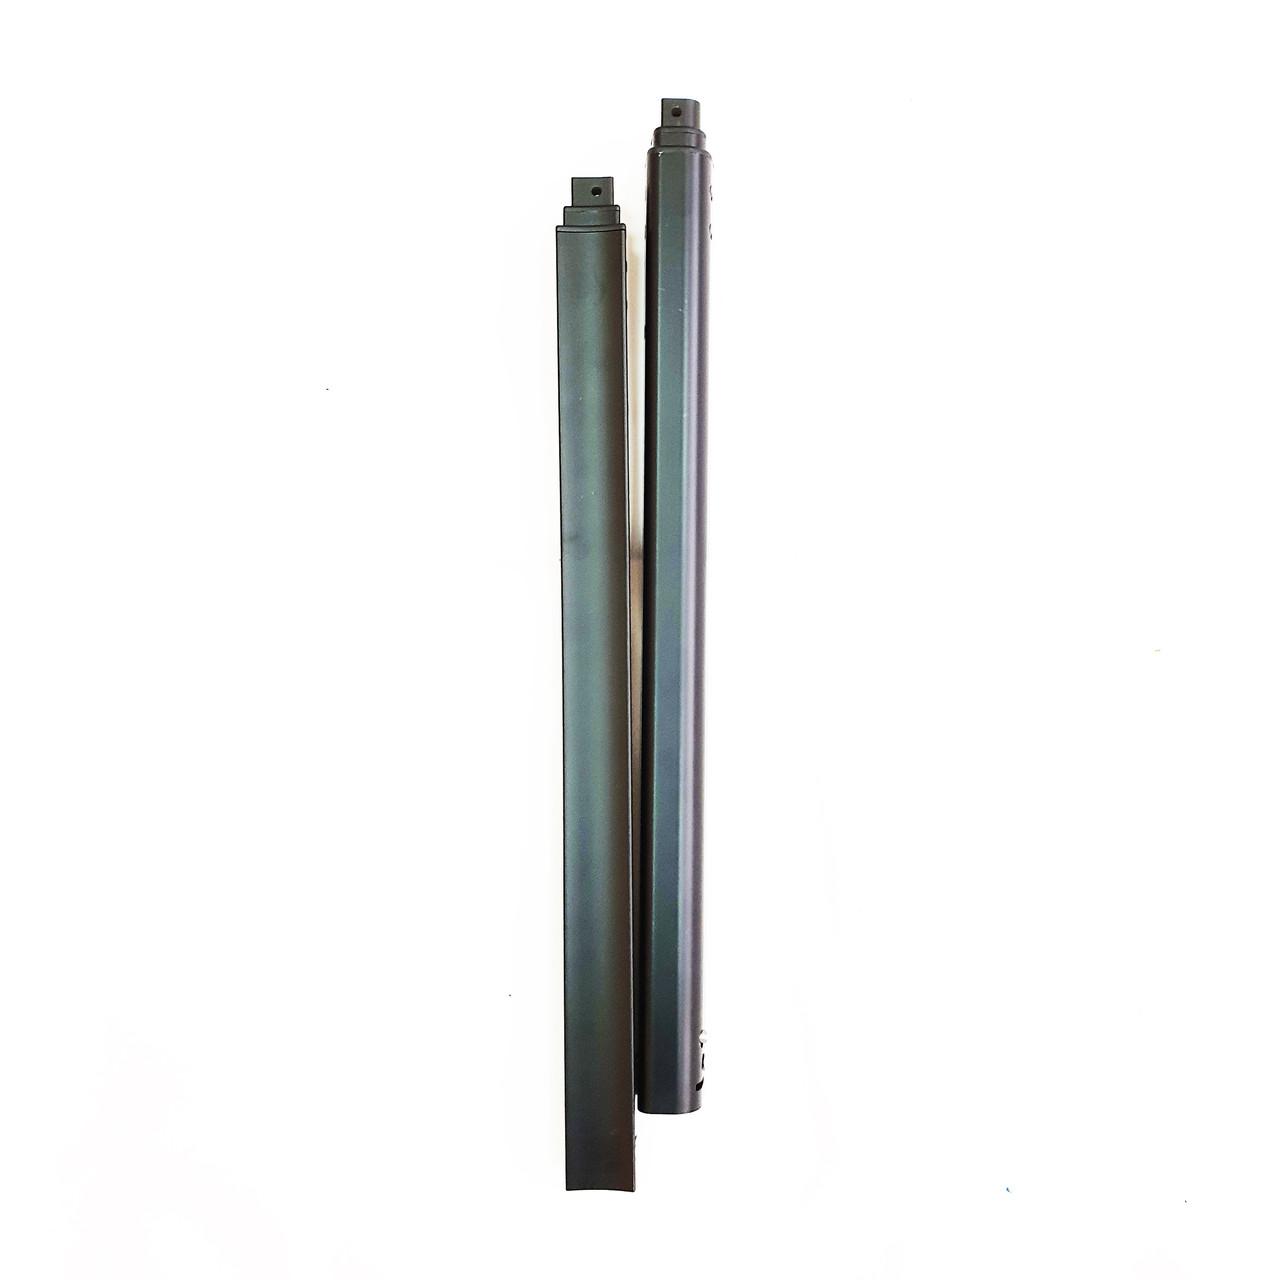 Нижня частина  телескопічної ручки моноколеса KingSong 18L; 18XL. Комплект.